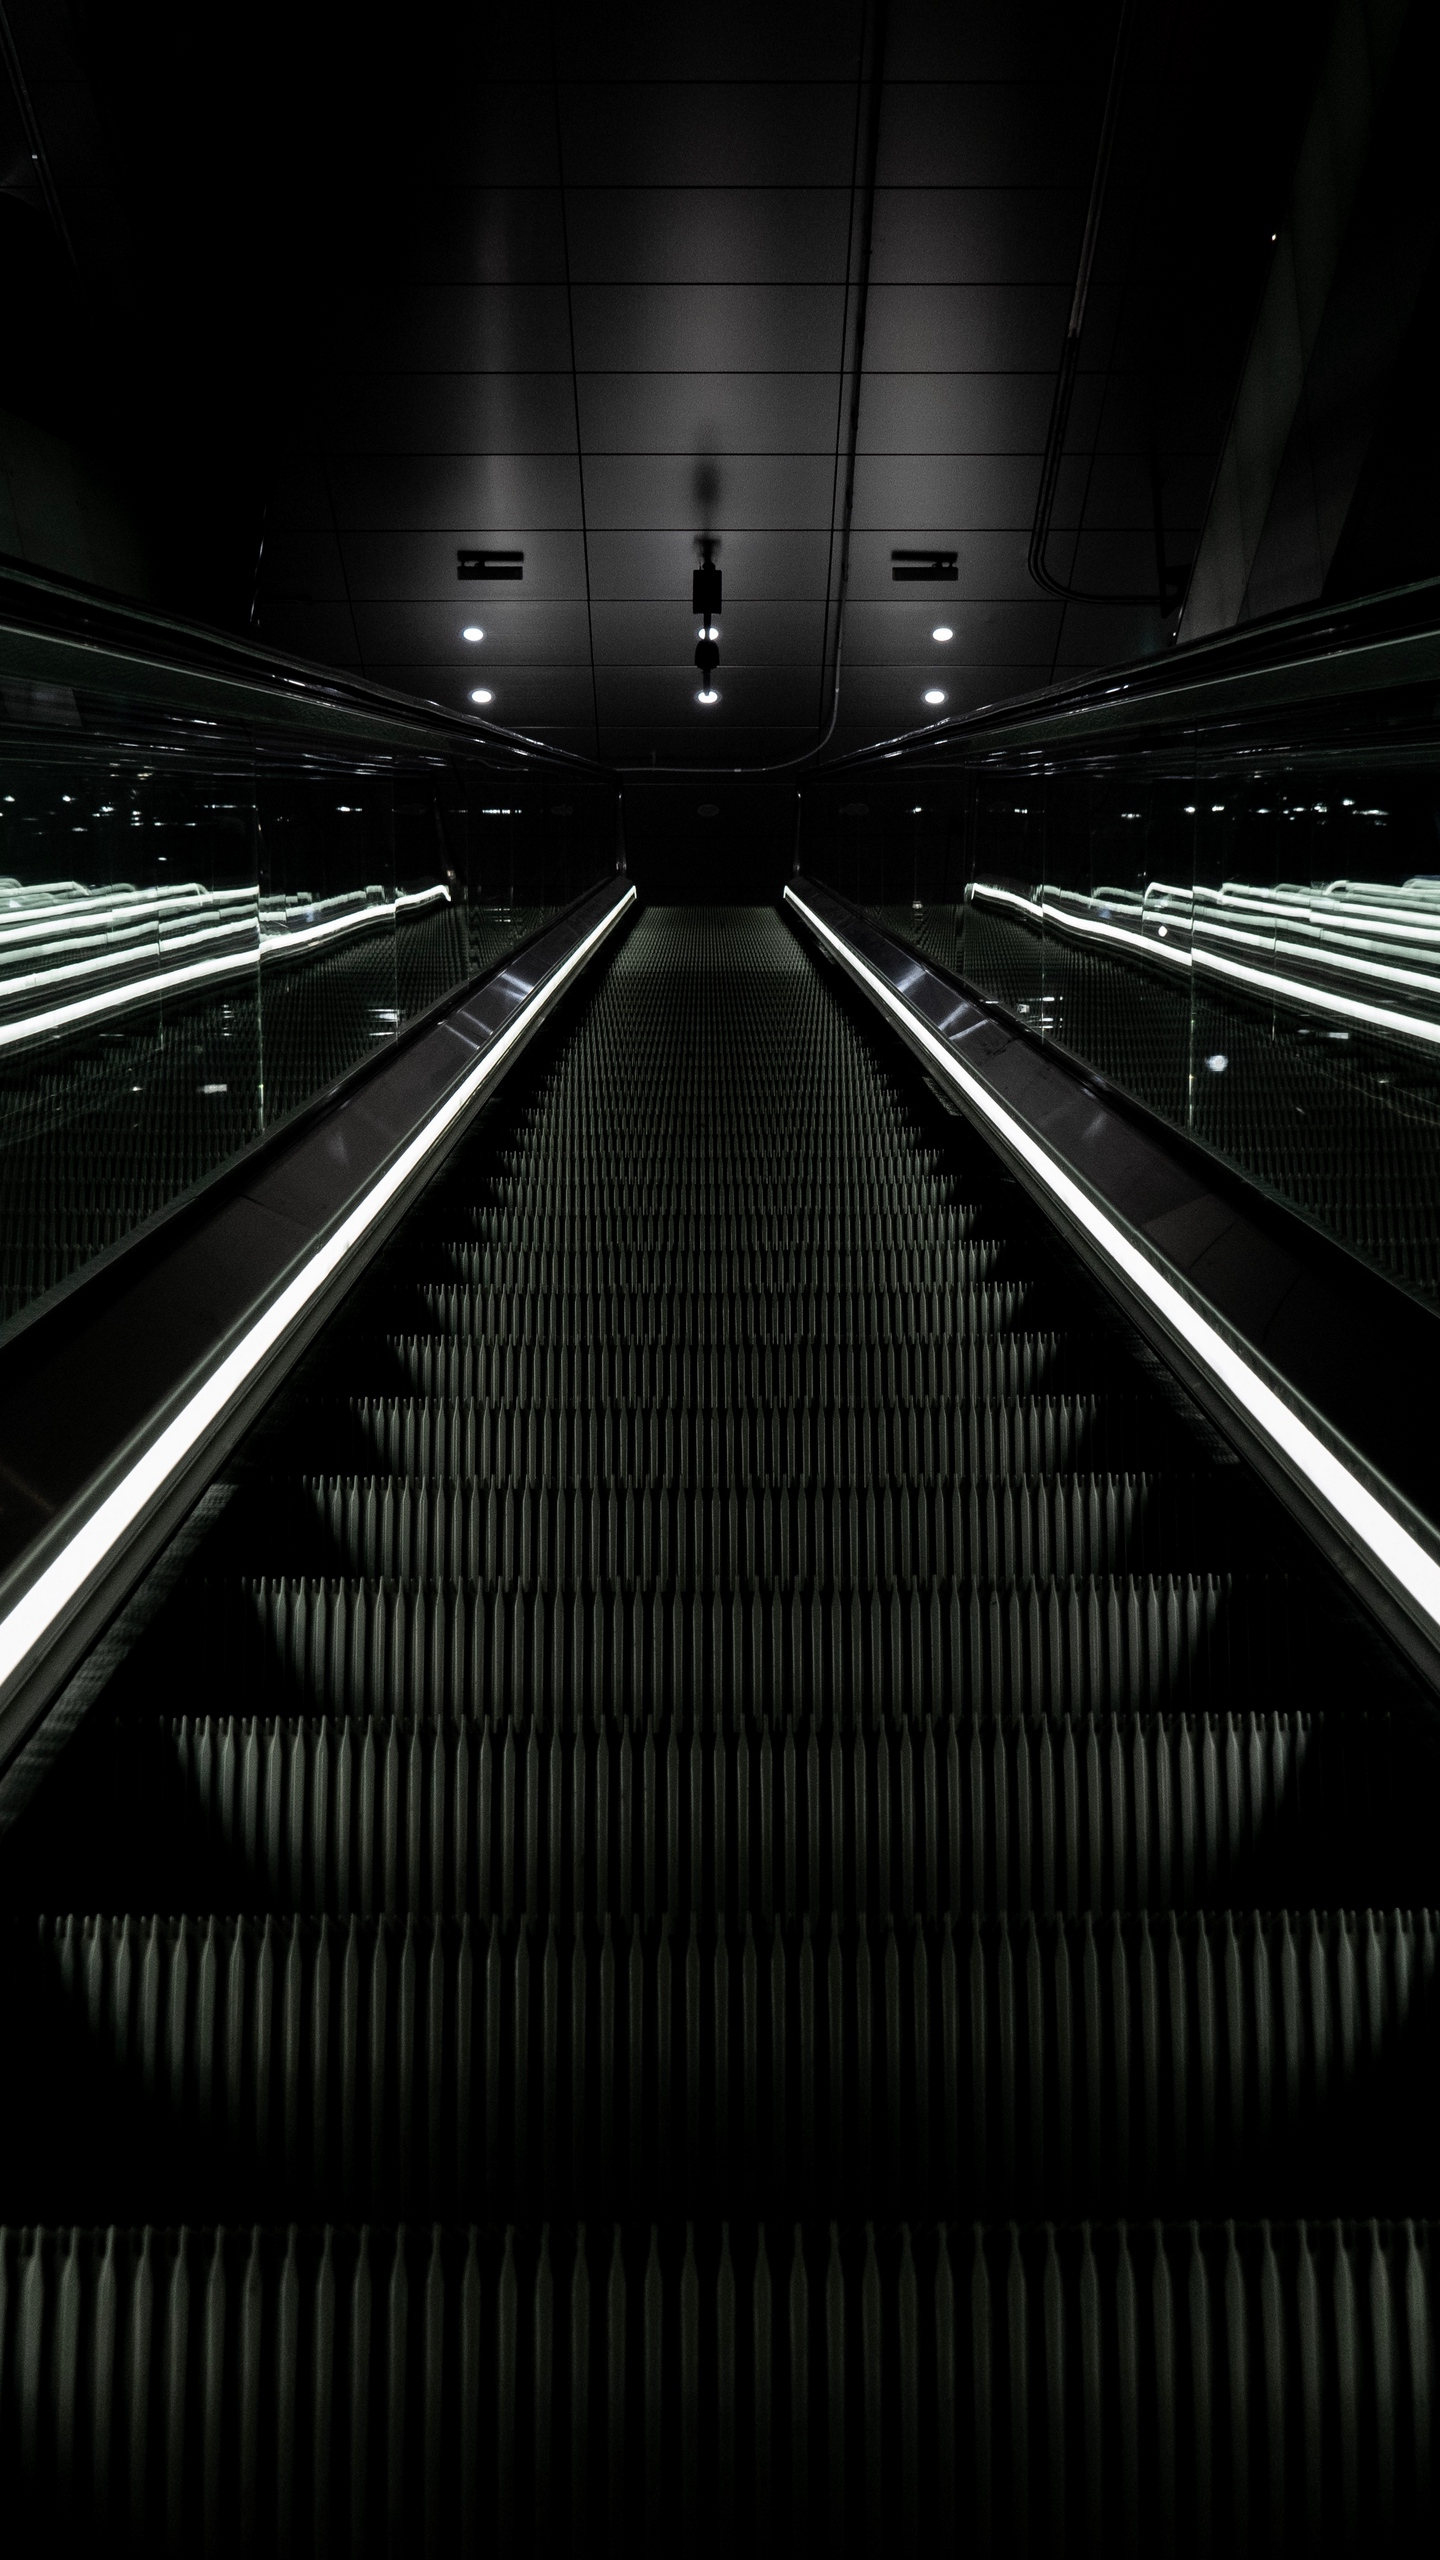 Download wallpaper 1440x2560 escalator stairs dark descent qhd 1440x2560